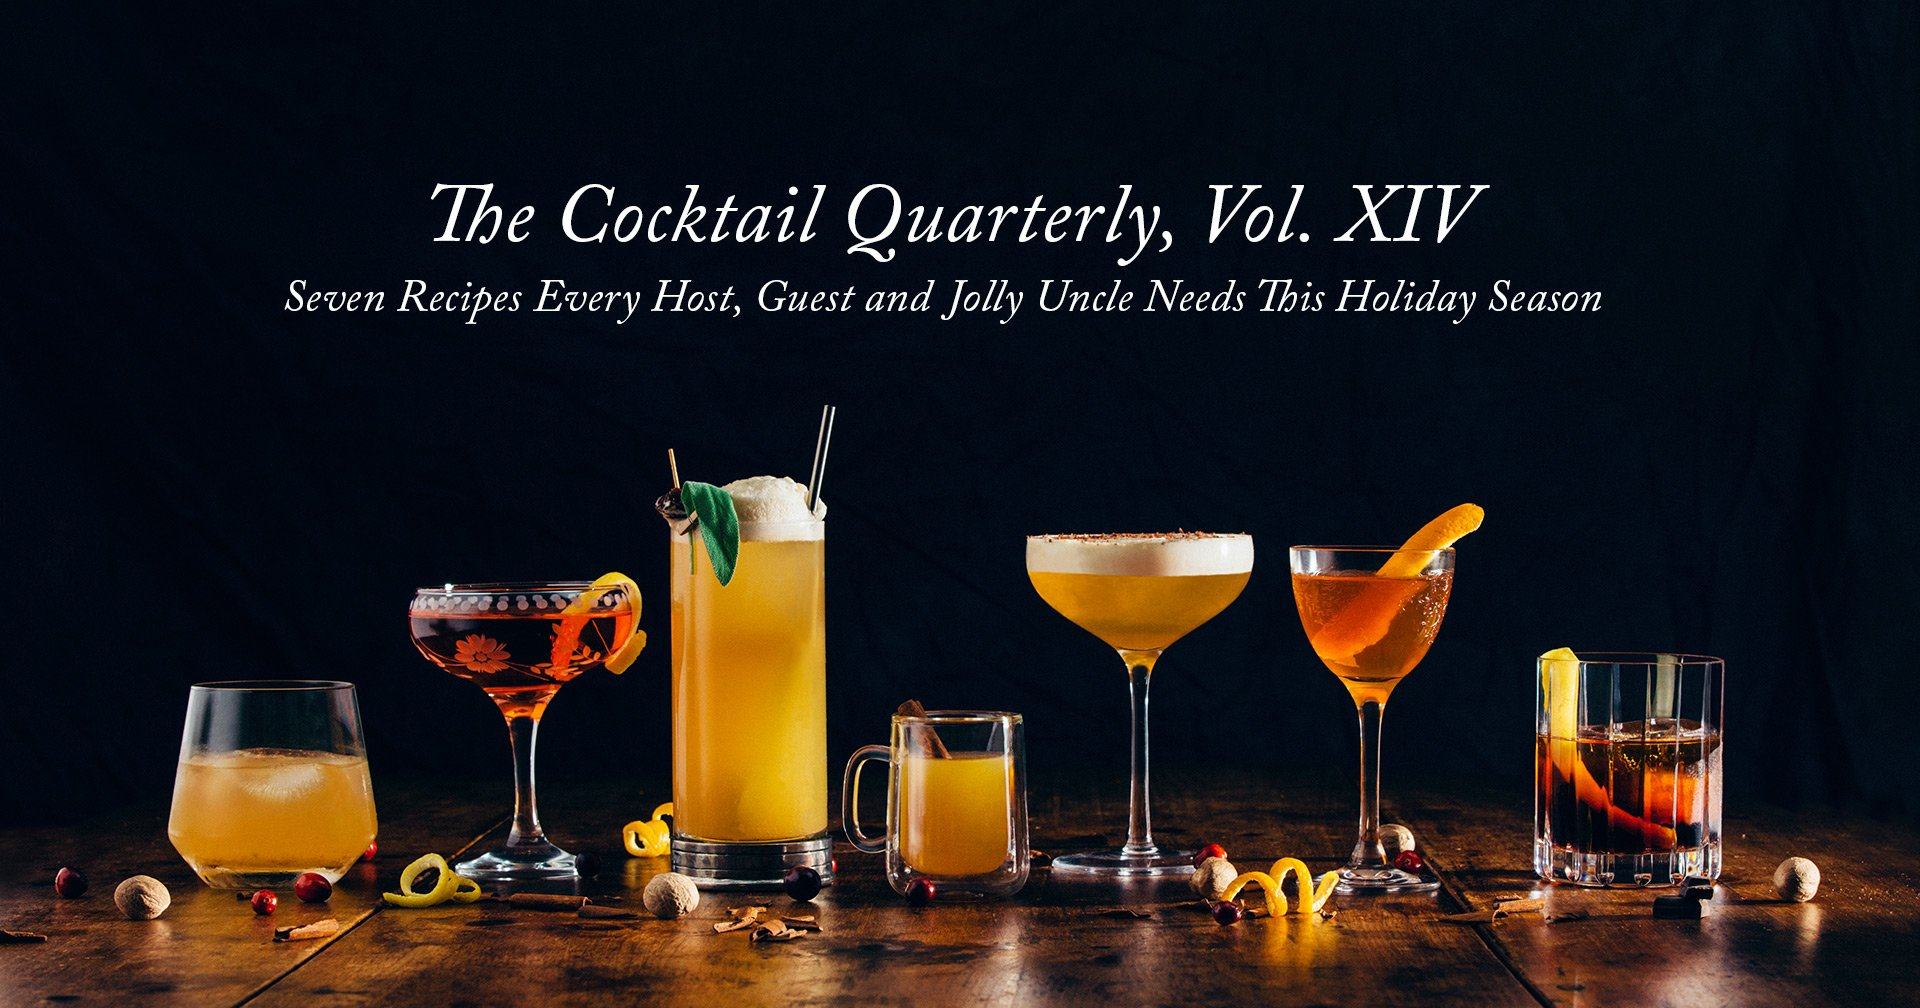 The Cocktail Quarterly Vol. XIV